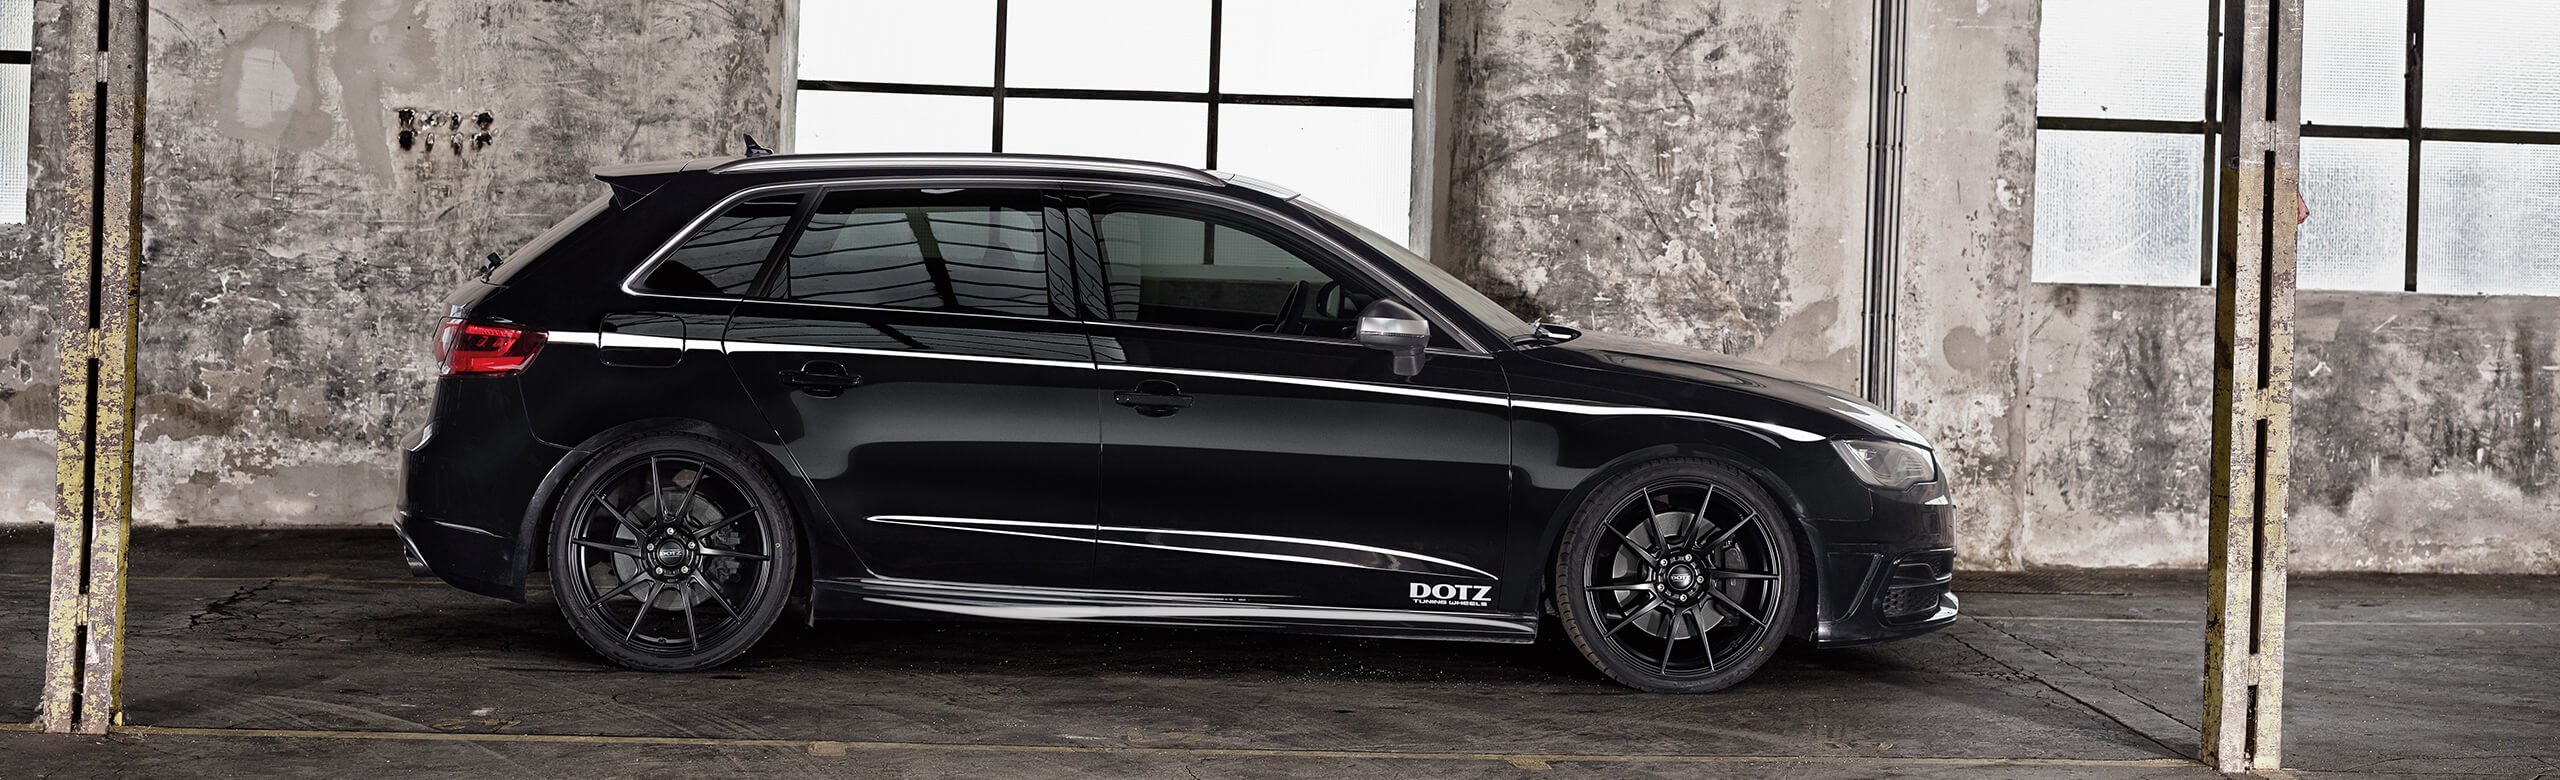 Dotz Kendo Dark auto